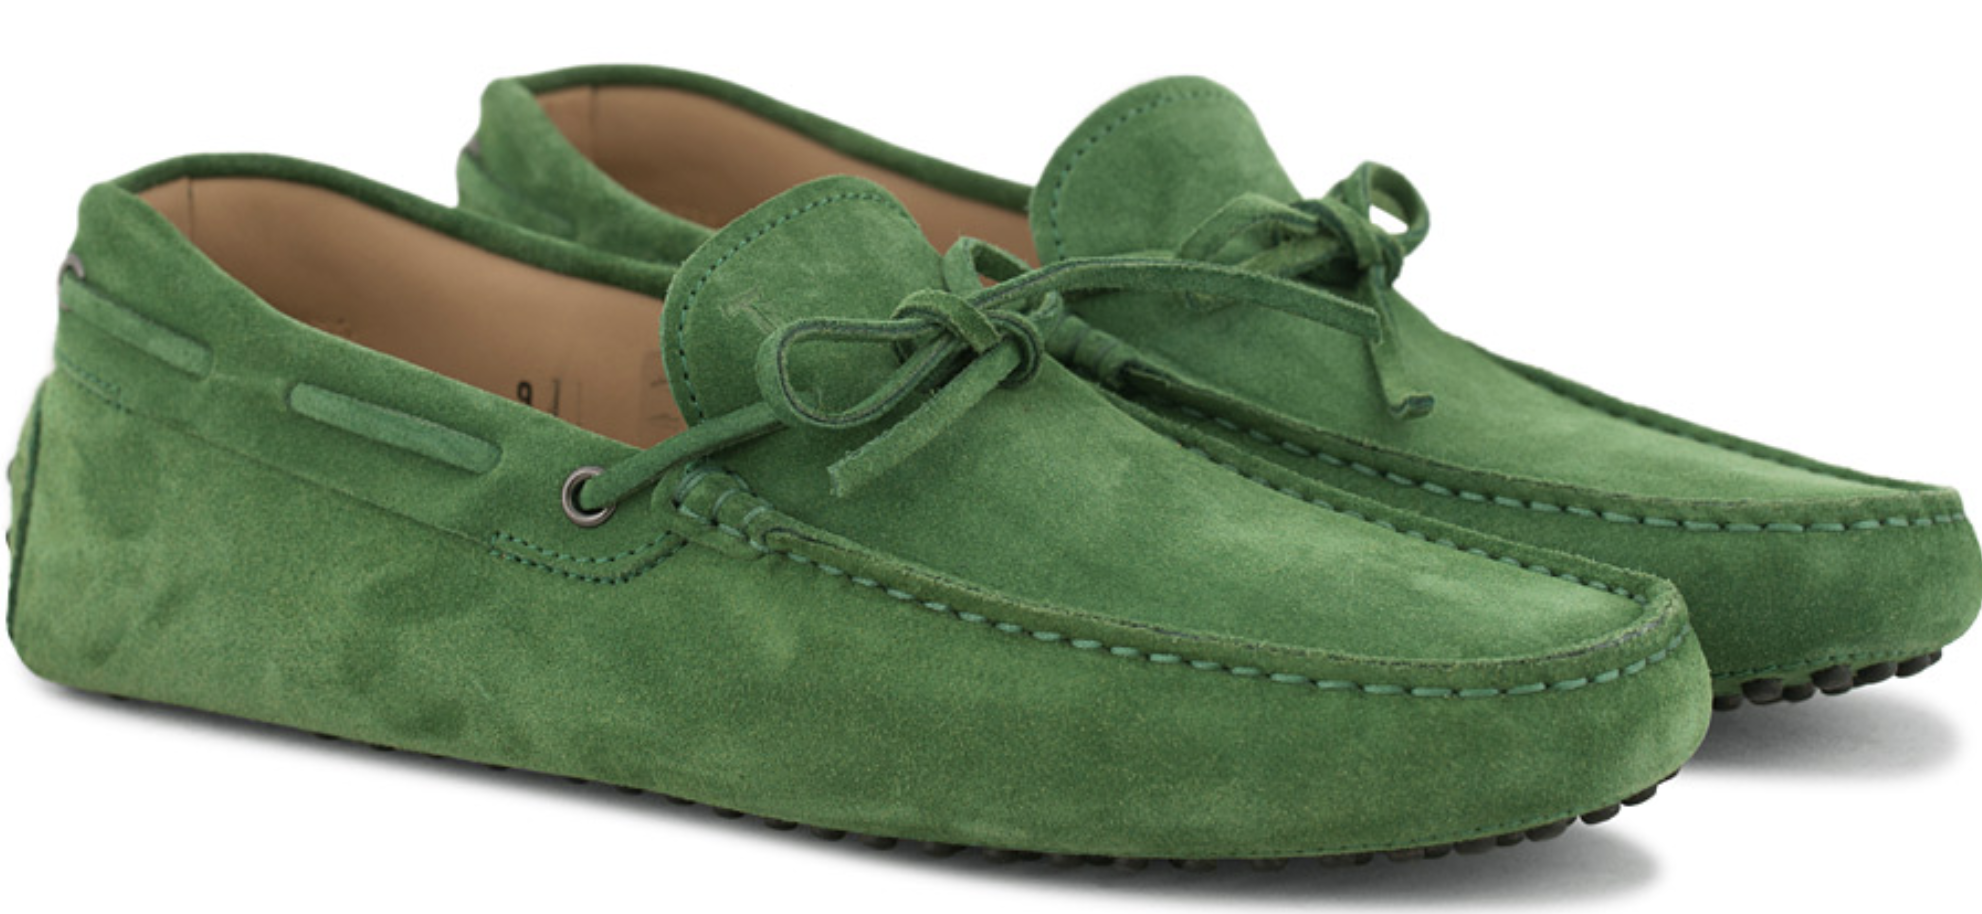 favrige sko